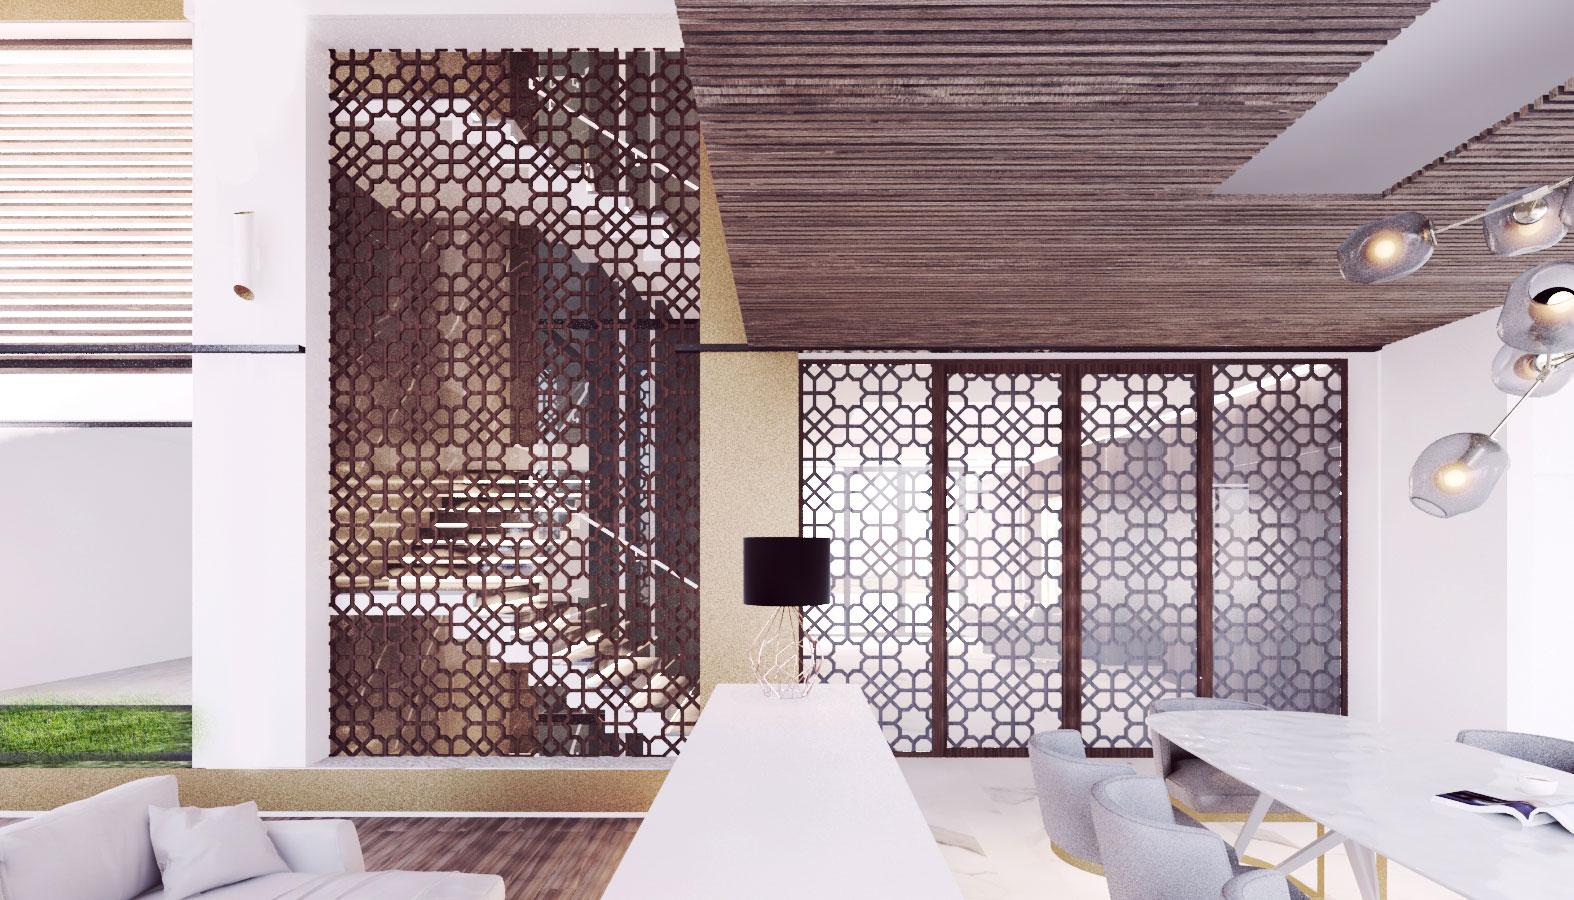 https://nbc-arhitect.ro/wp-content/uploads/2020/10/NBC-Arhitect-_-residences-_-Mogo-Villa-_-Romania-_-interior-view_21.jpg